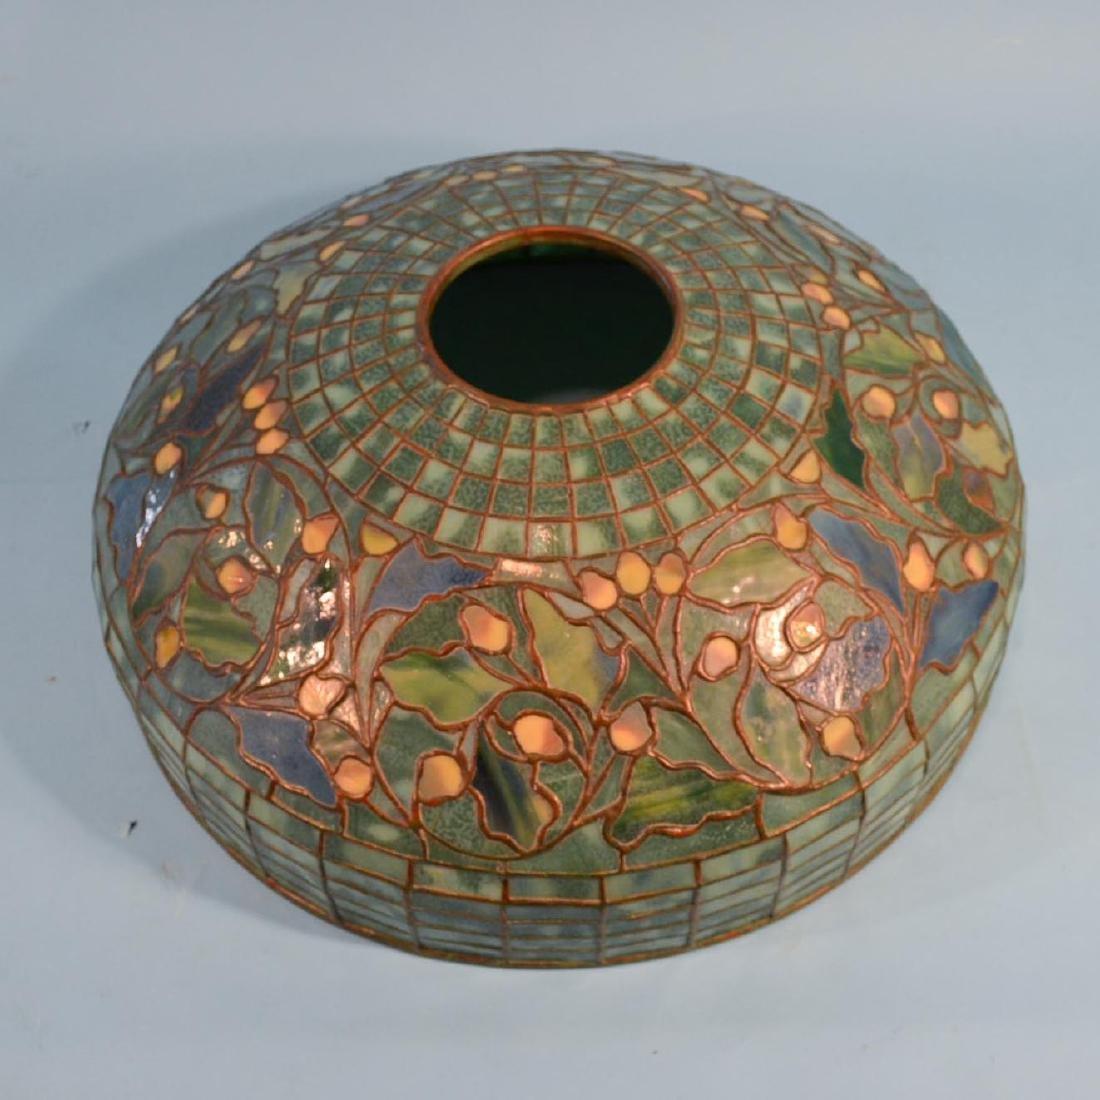 Tiffany Studios Acorn & Oak Leaf Stained Glass Lamp - 13